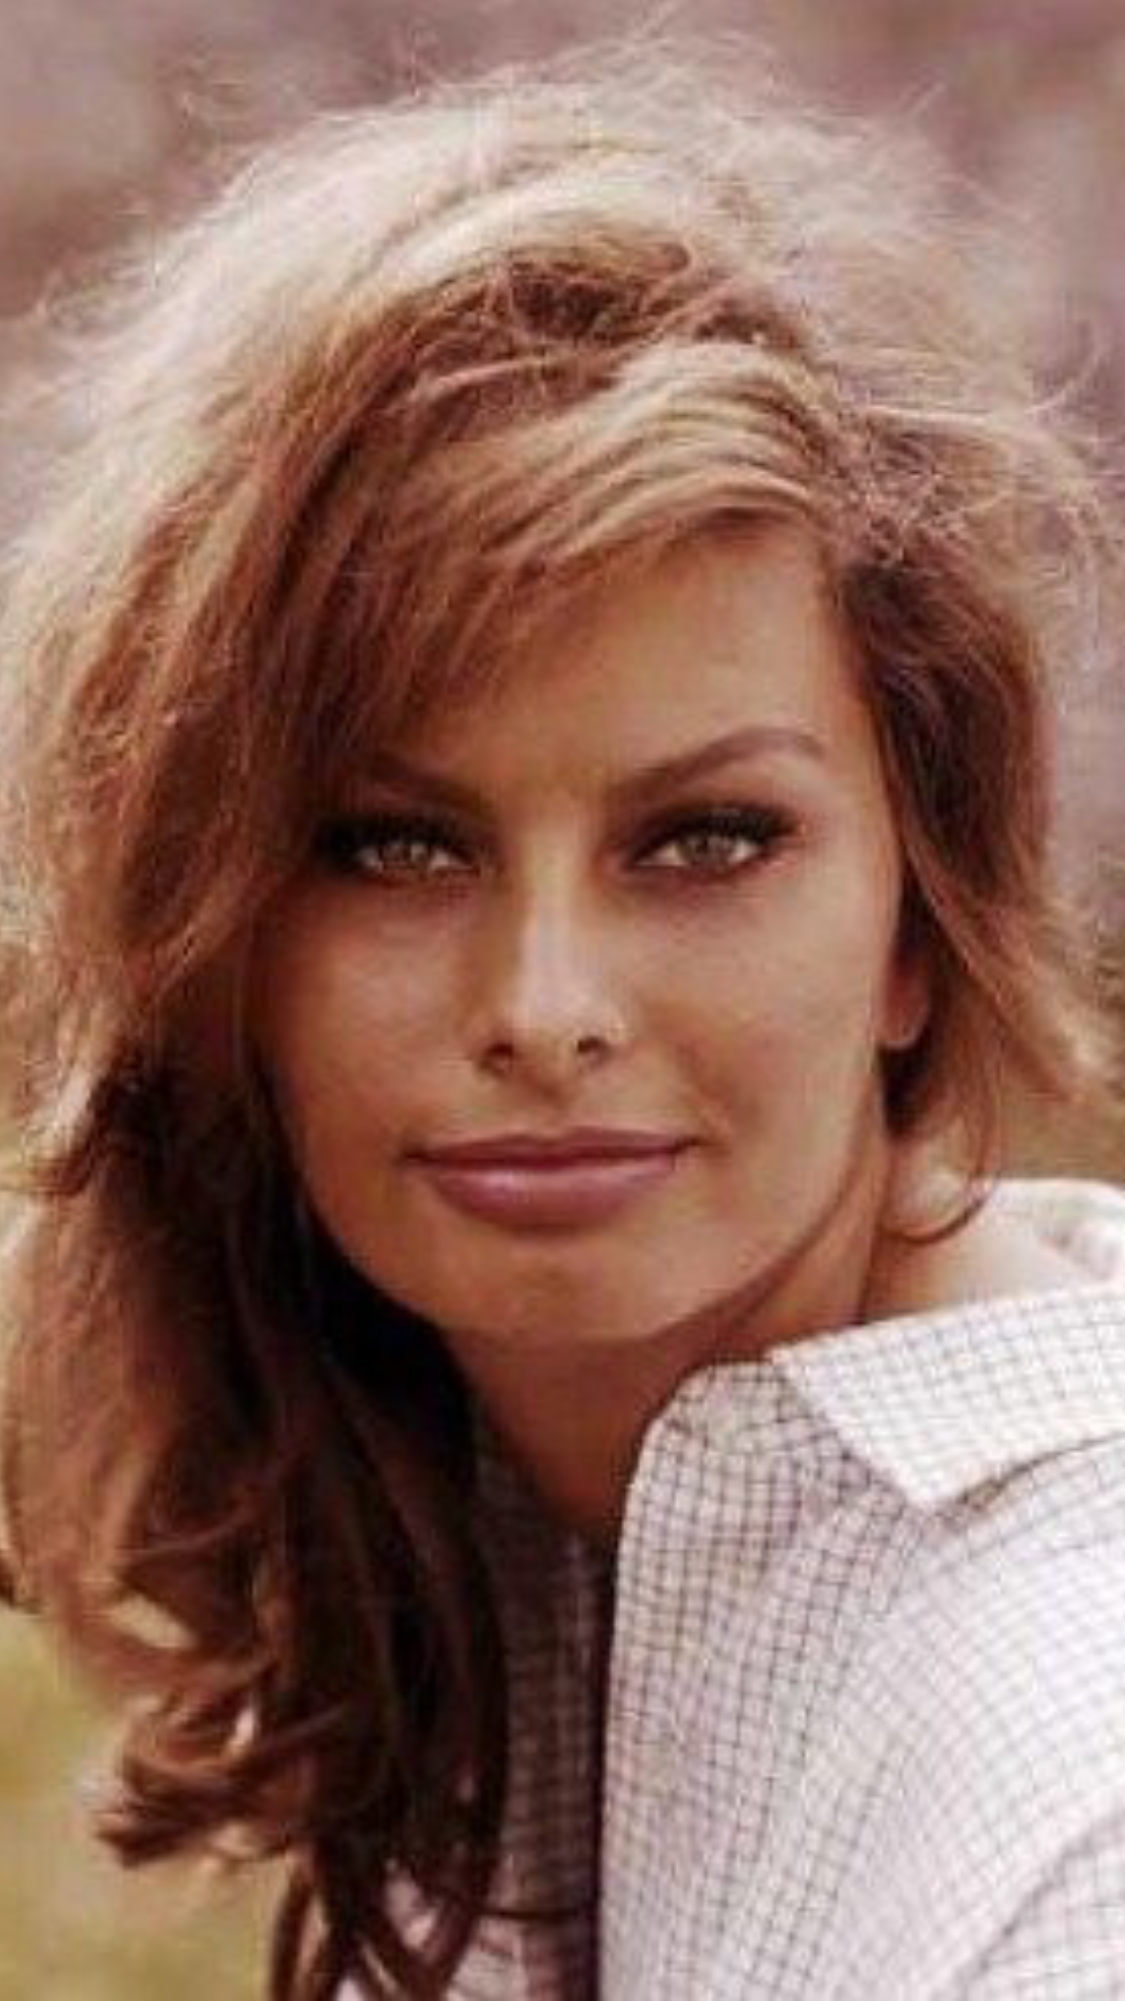 Pin By William Sarno On Sofia In 2019 Sophia Loren Audrey Hepburn Audrey Hepburn Style